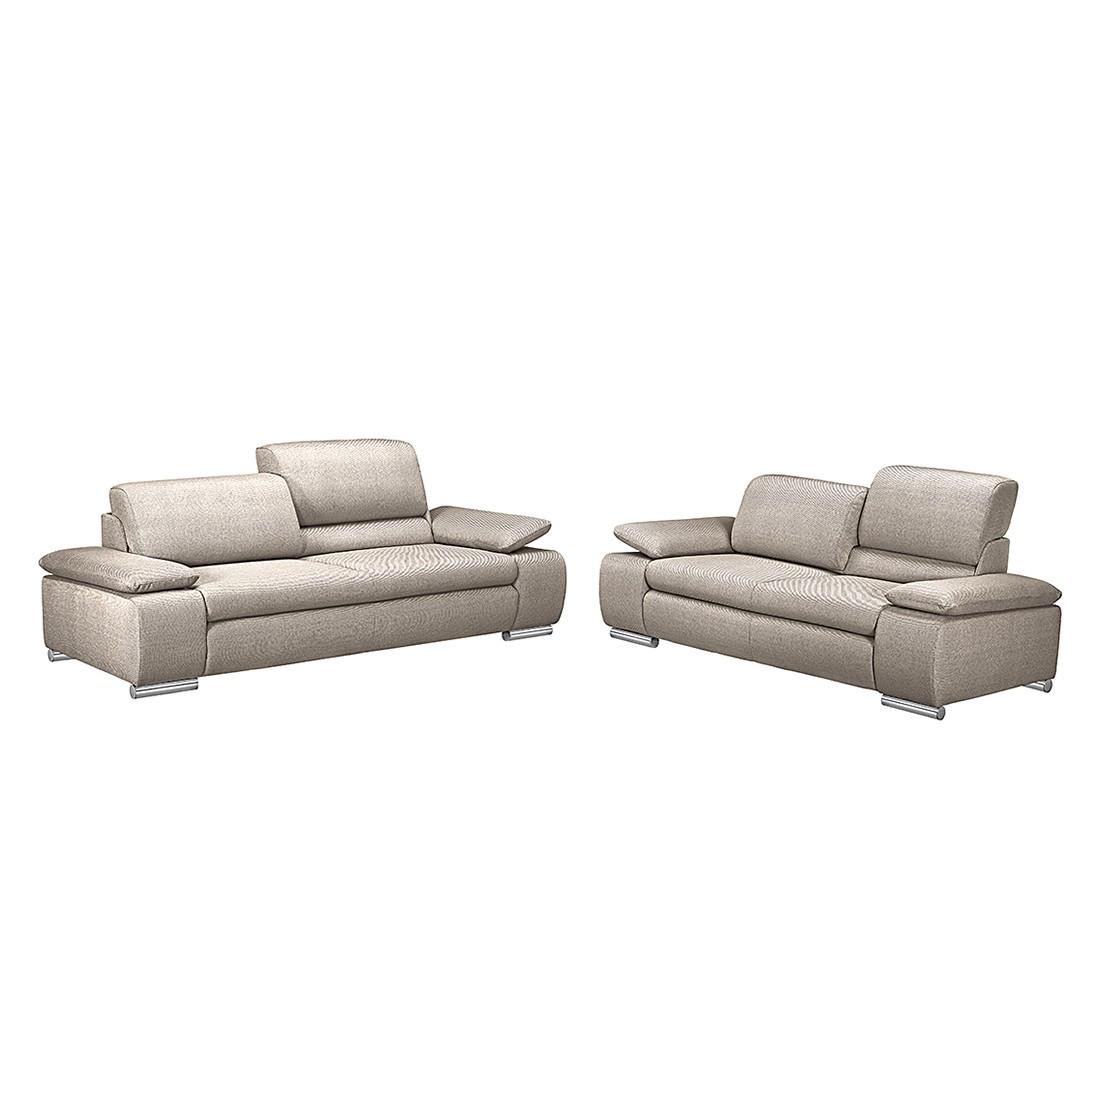 polstergarnitur masca 3 2 strukturstoff beige loftscape kaufen. Black Bedroom Furniture Sets. Home Design Ideas